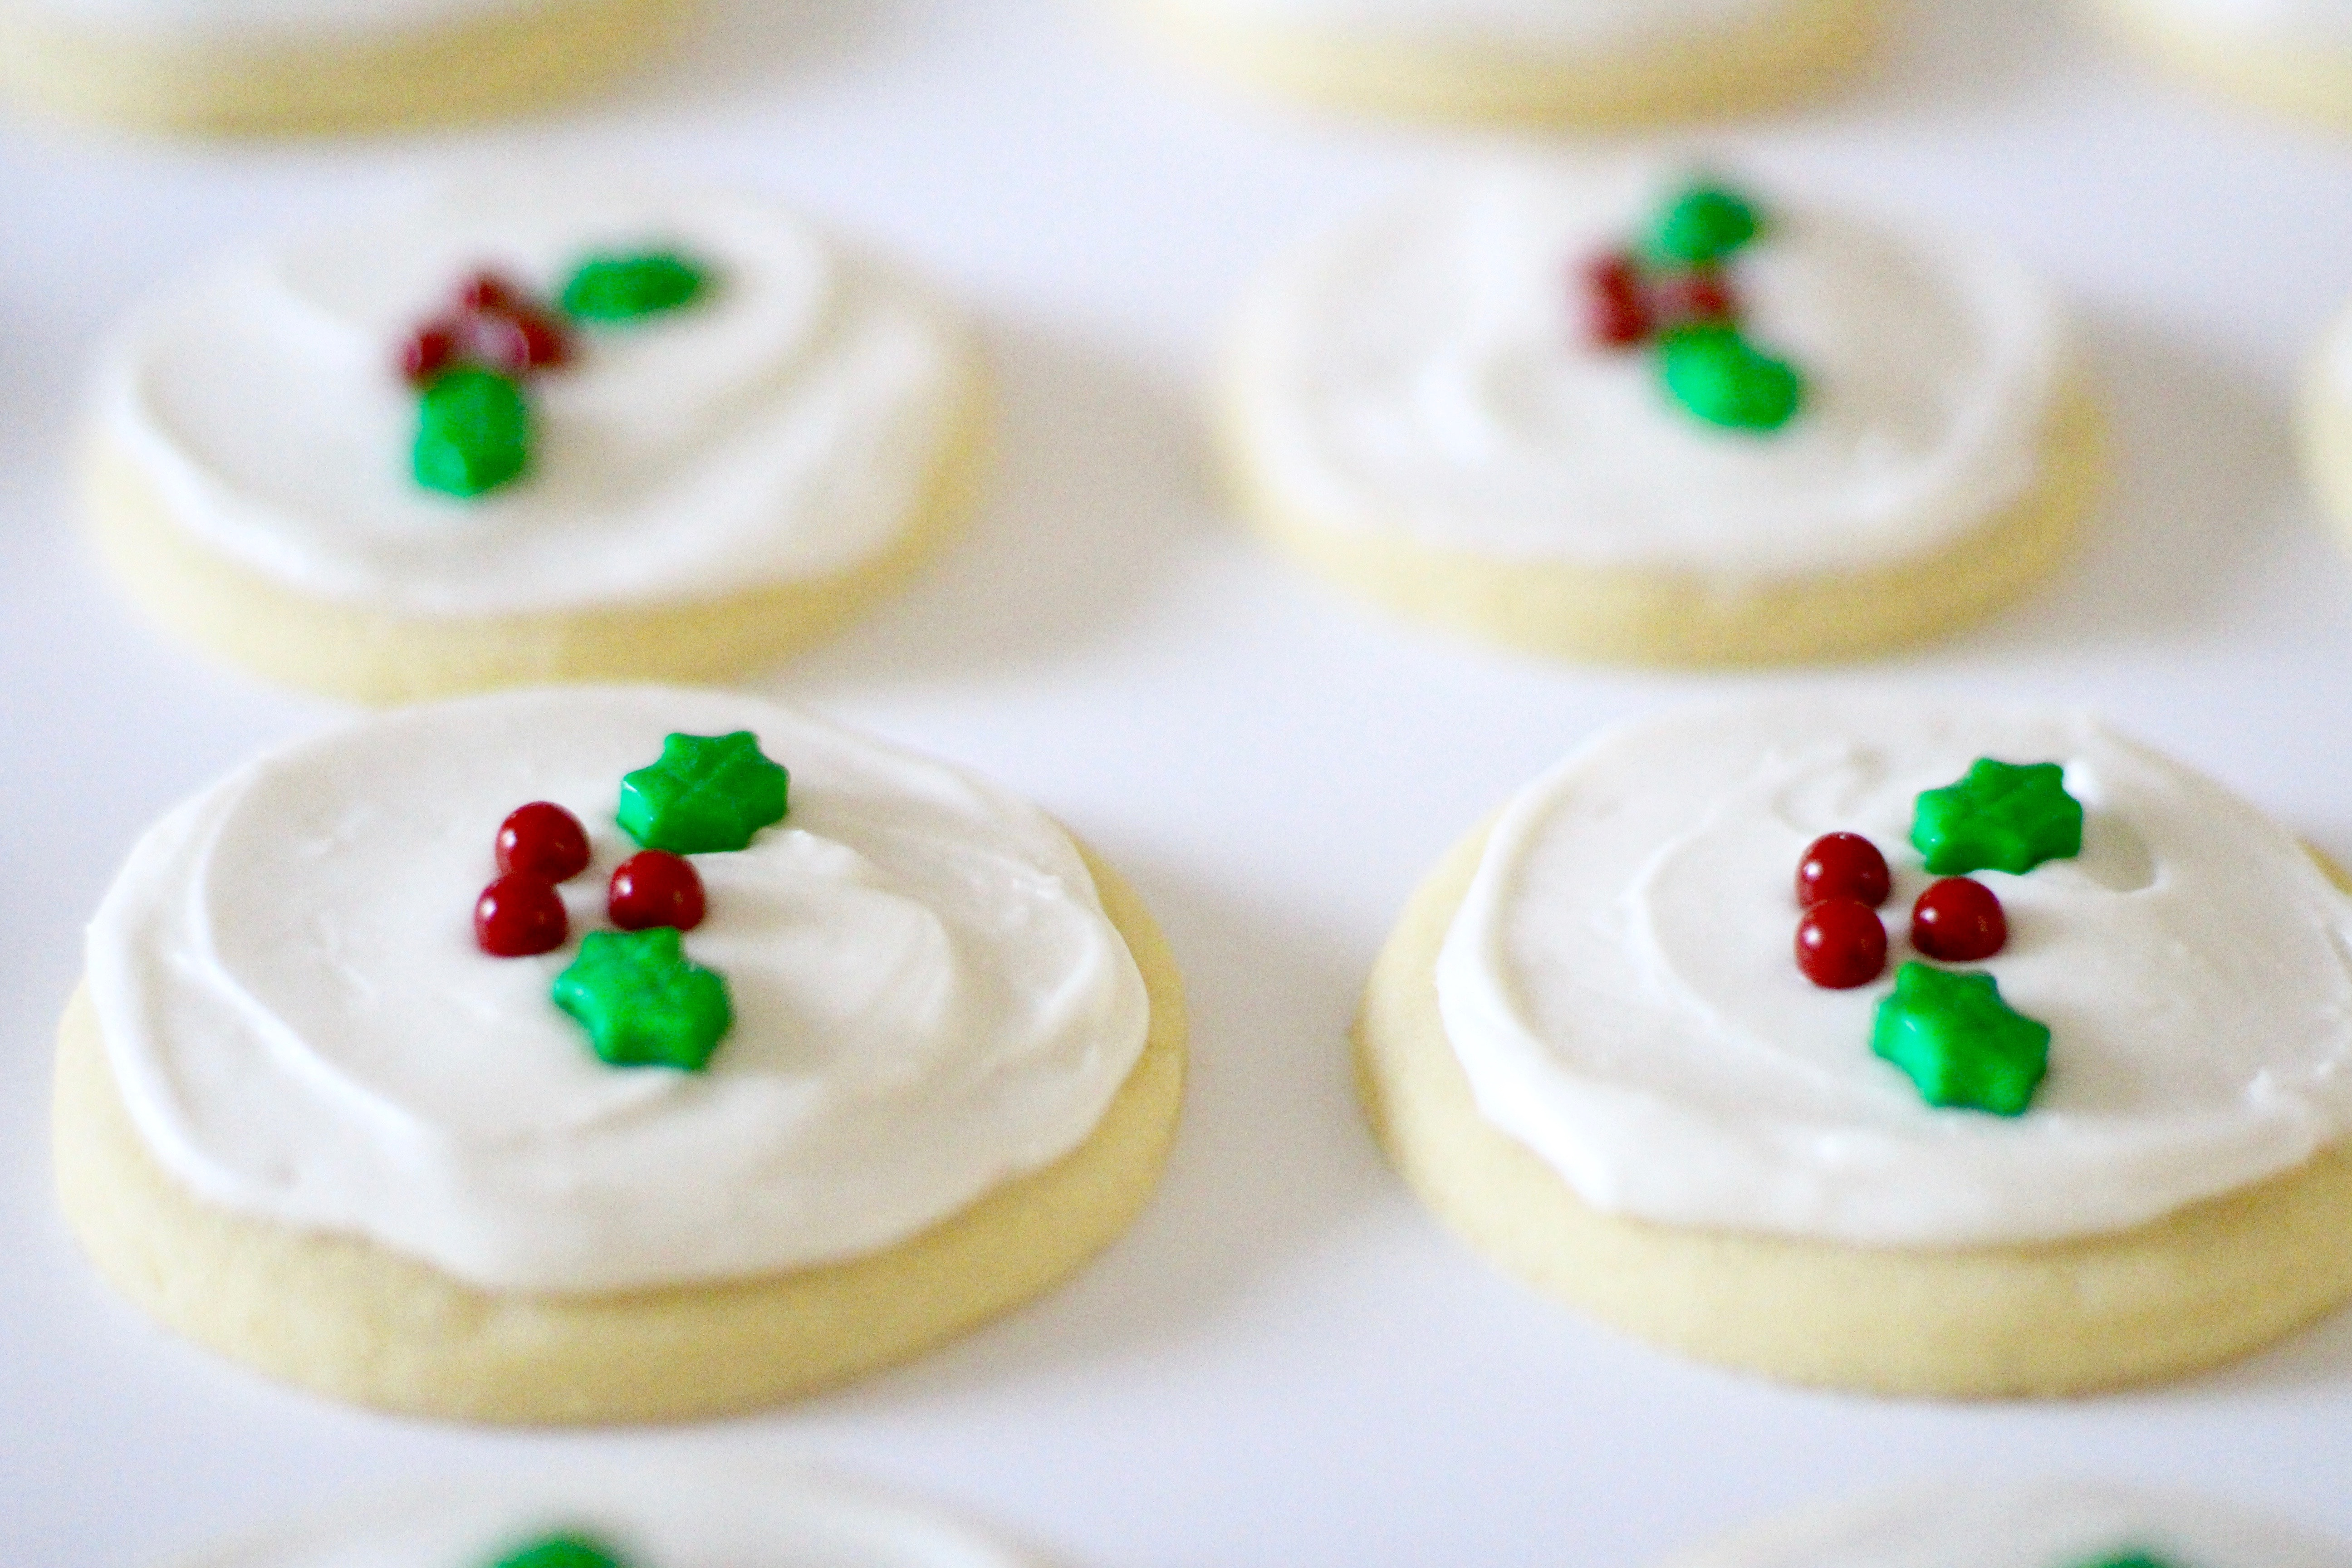 Holly Holiday Sugar Cookies - Rainbow Delicious